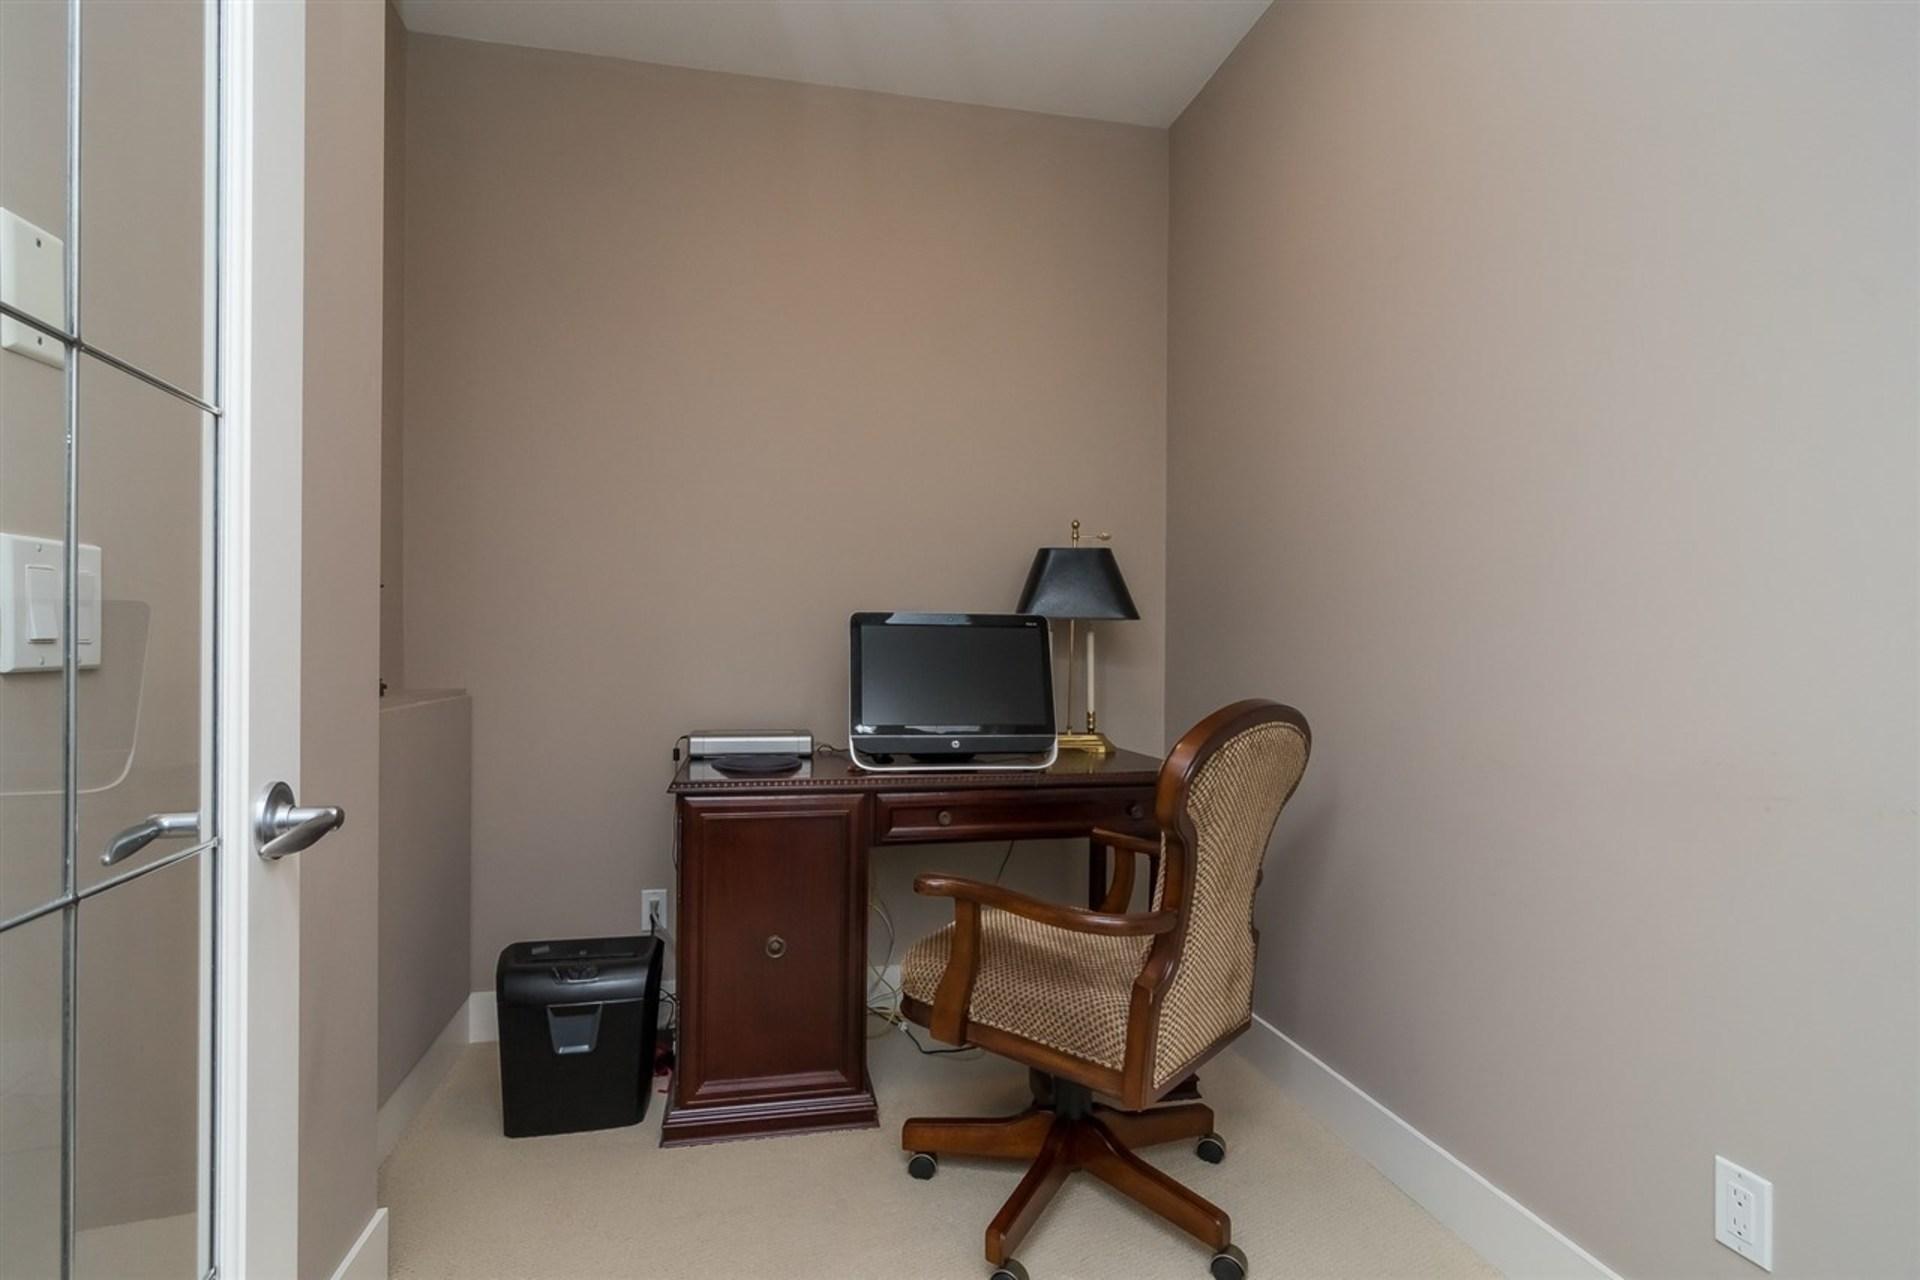 16447-64-avenue-cloverdale-bc-cloverdale-16 at 305 - 16447 64 Avenue, Cloverdale BC, Cloverdale